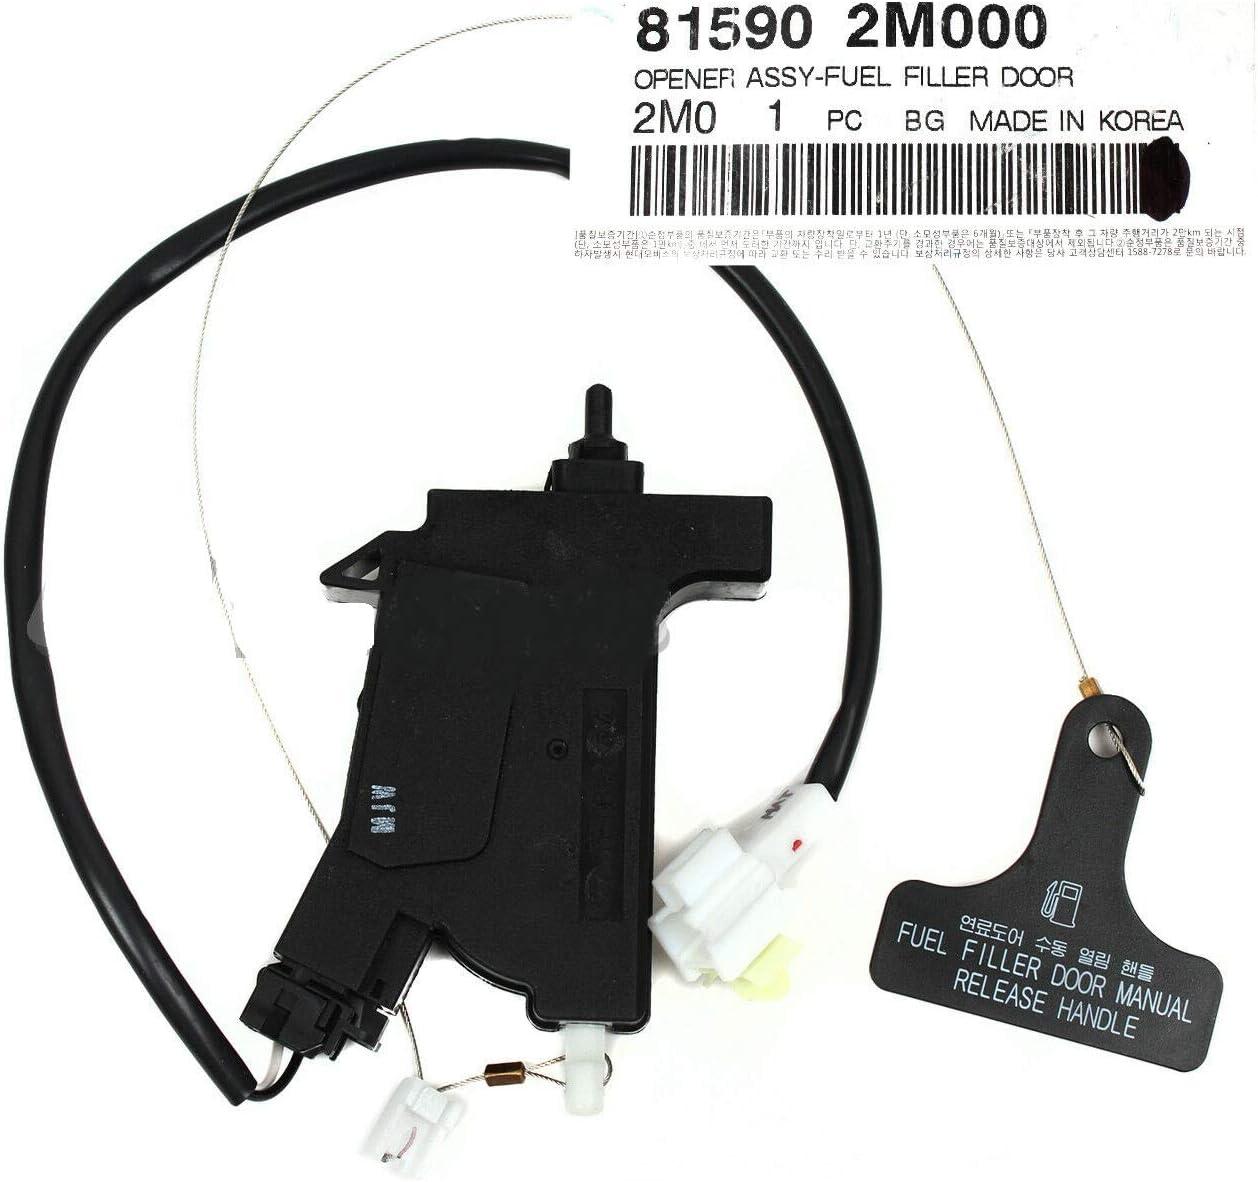 GENUINE Fuel Filler Door Cable for 10-16 Hyundai Genesis Coupe OEM 815902M000